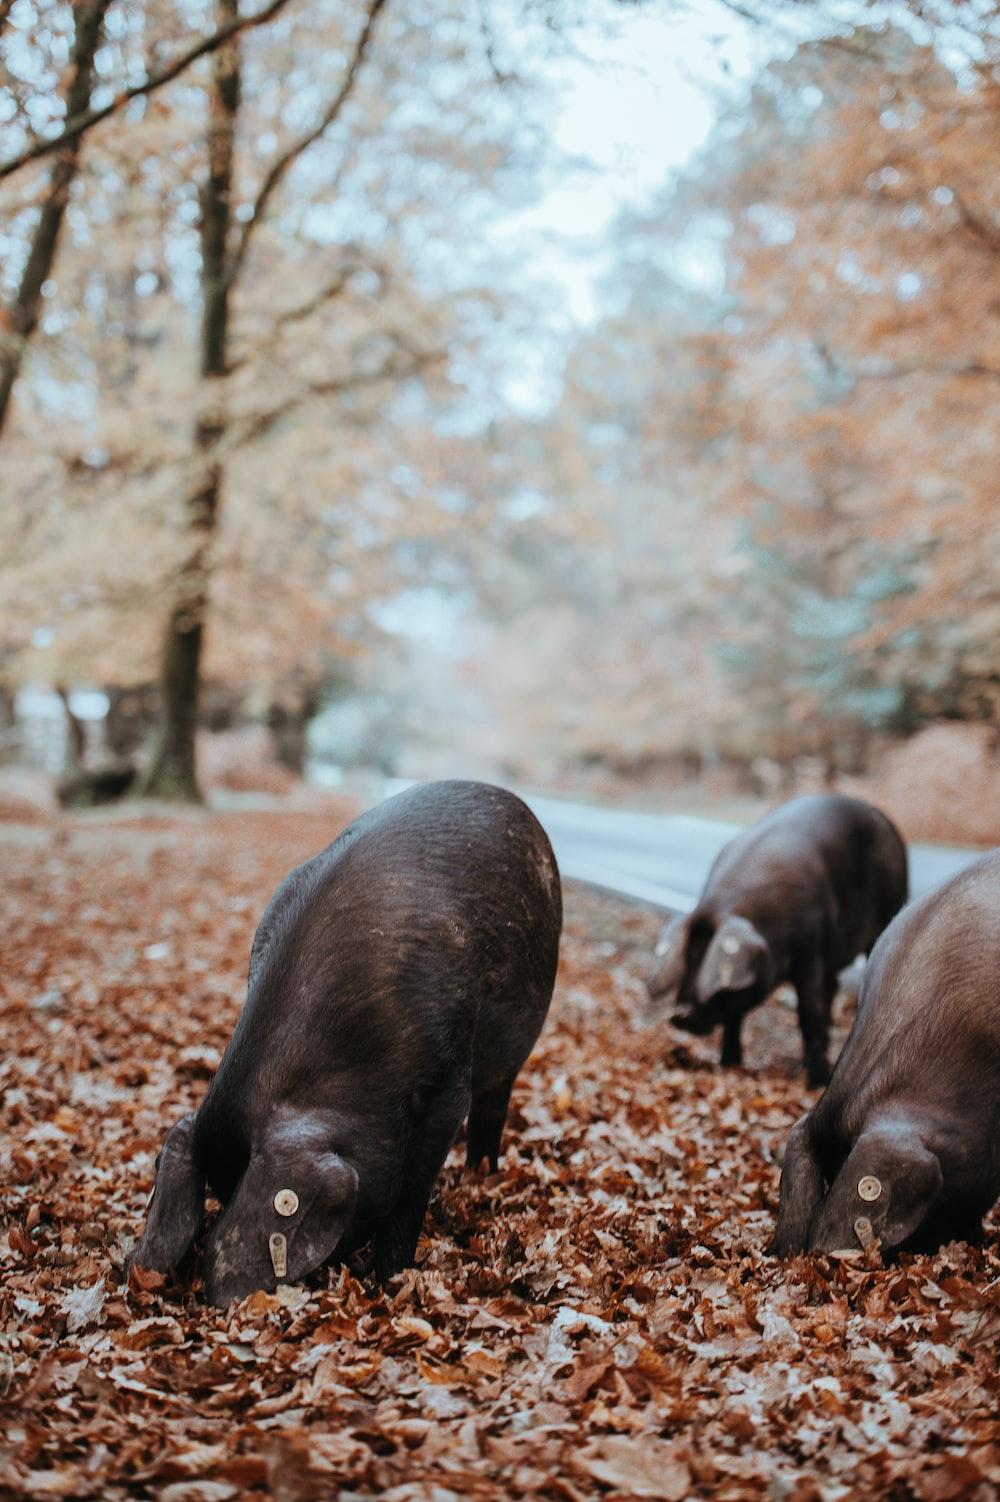 black pig on brown leaf